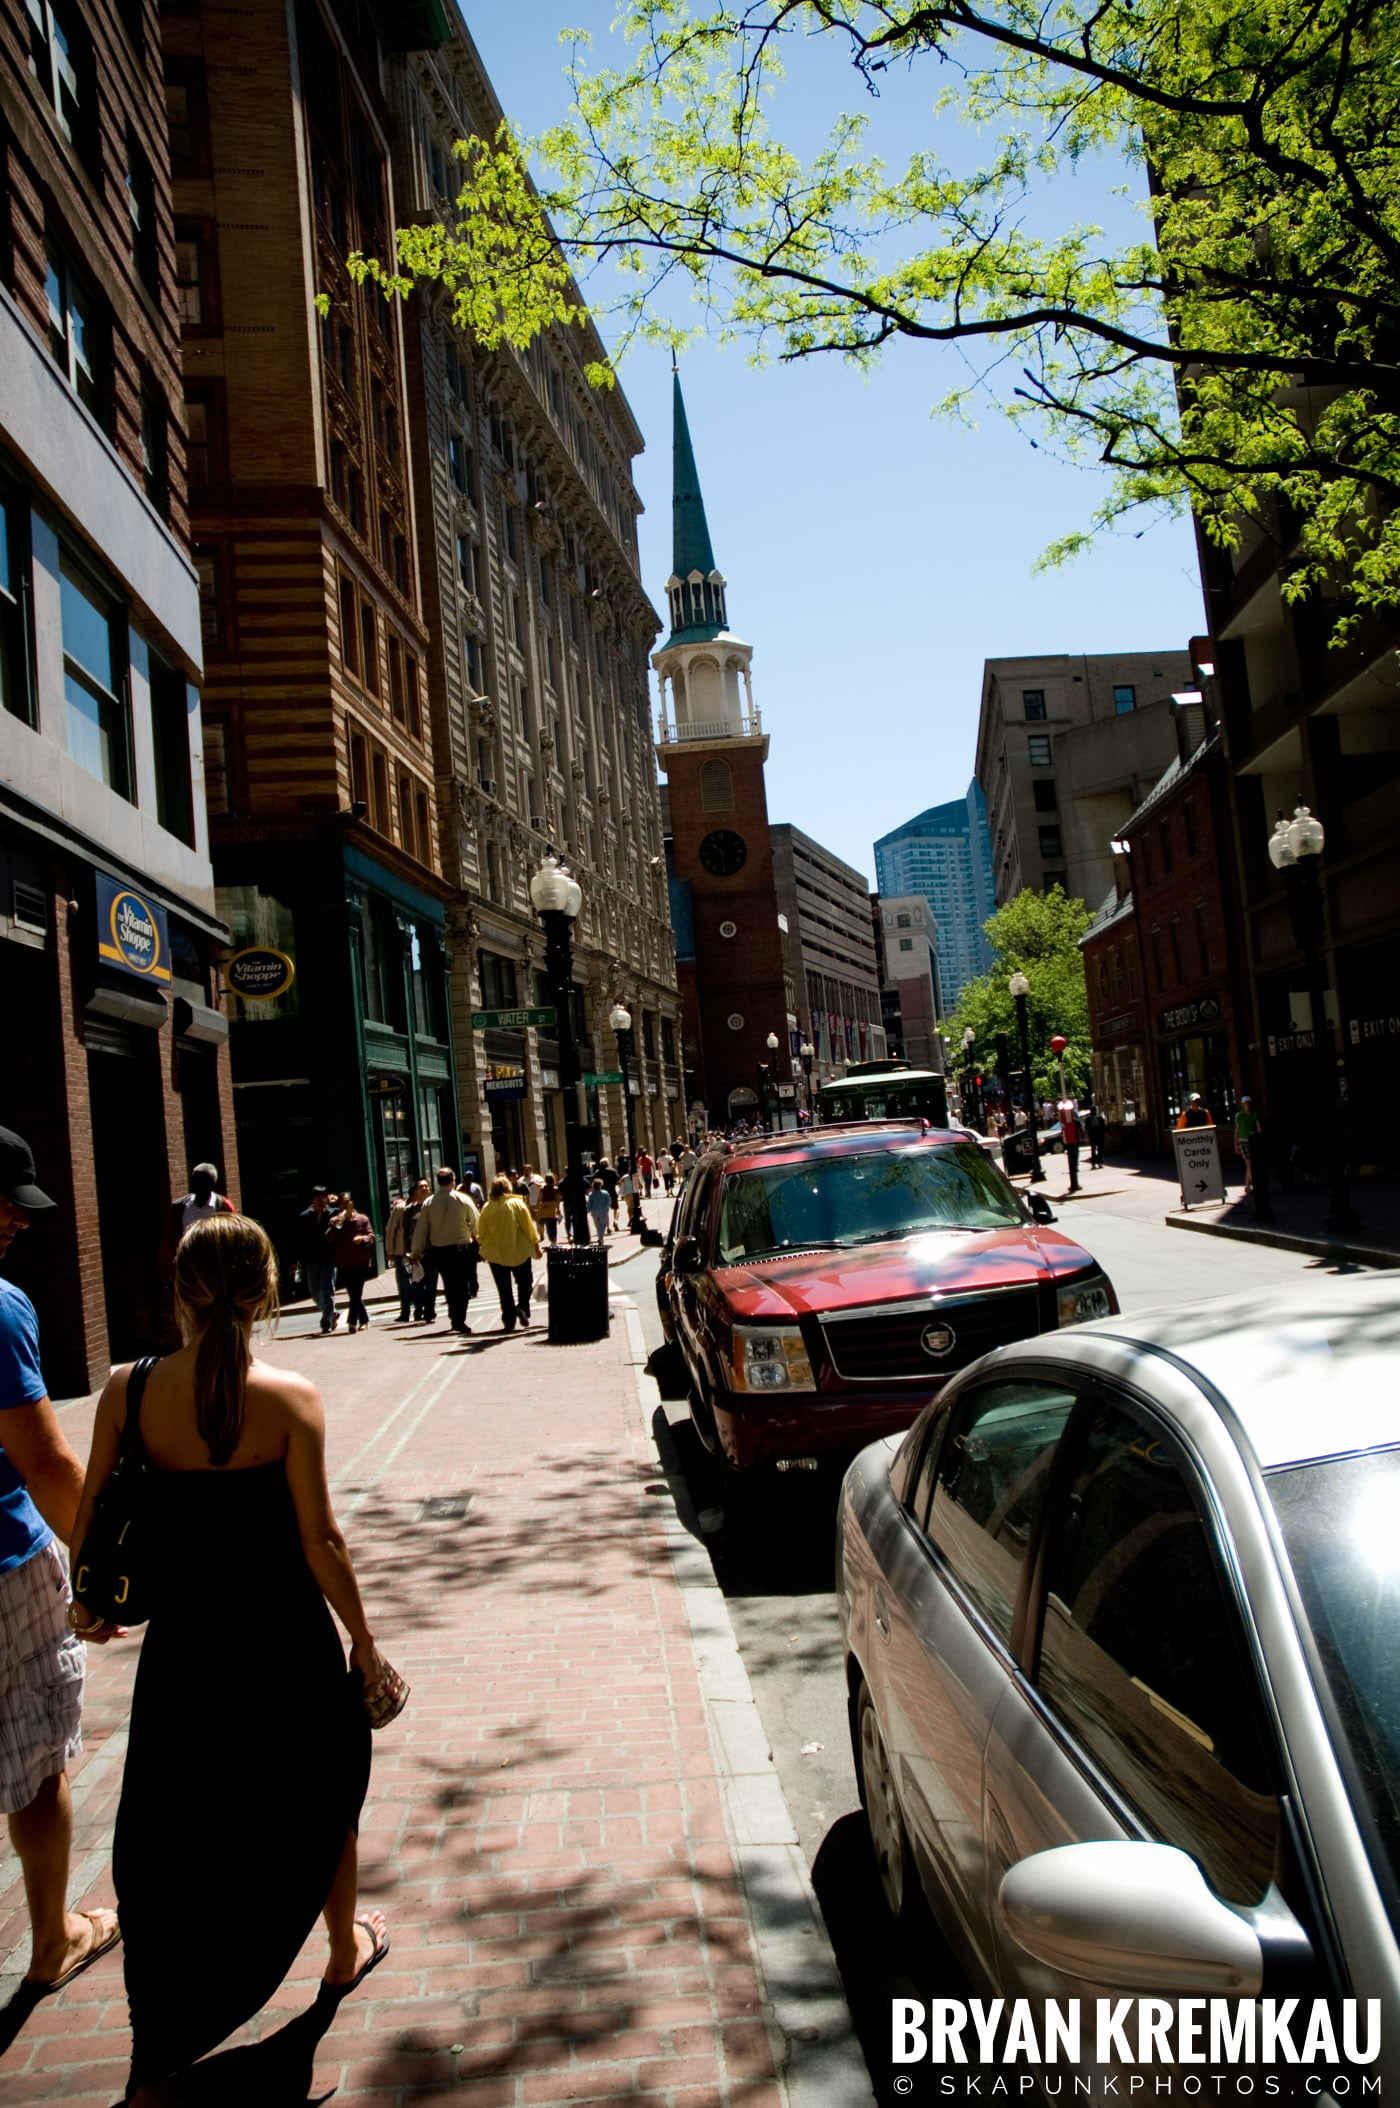 Memorial Day Weekend Trip to Boston - 5.25.08 (2)